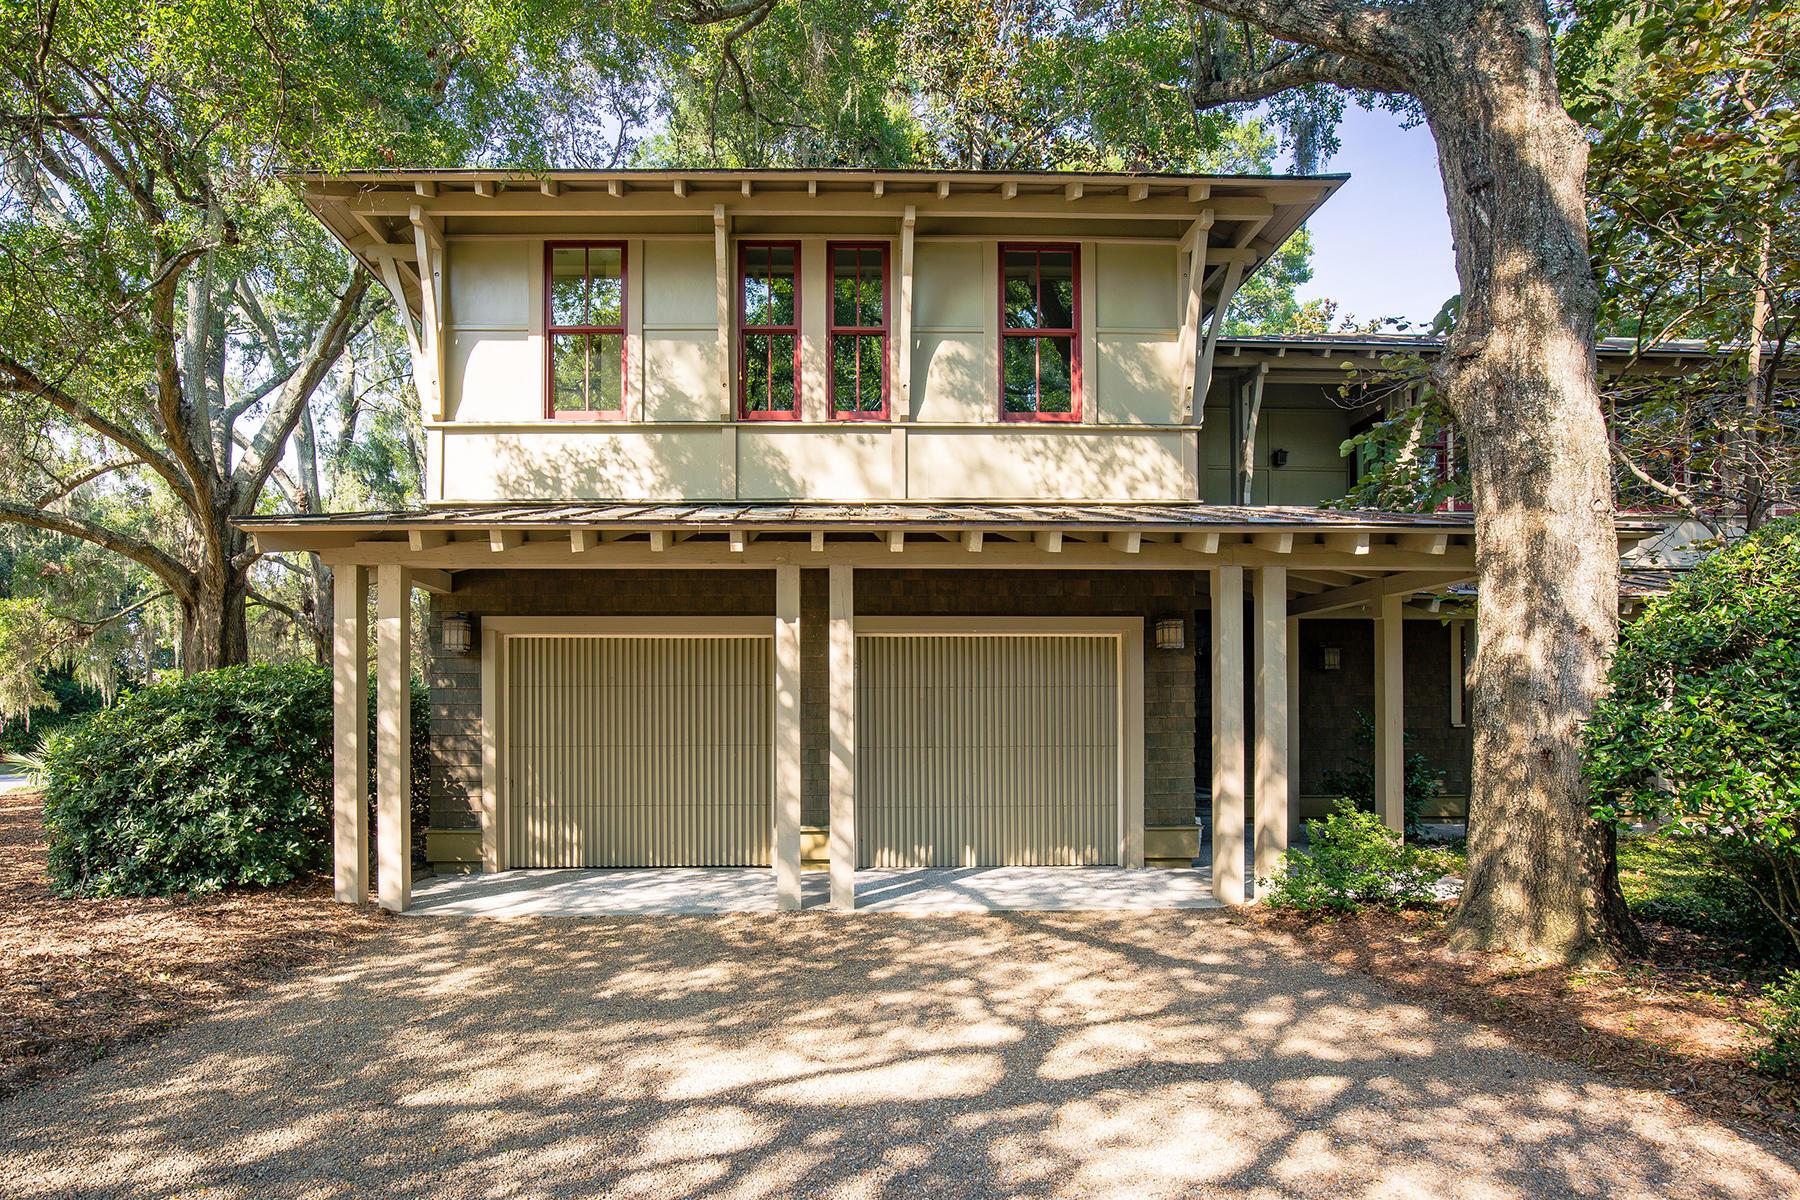 Ellis Oaks Homes For Sale - 672 Ellis Oak, Charleston, SC - 0